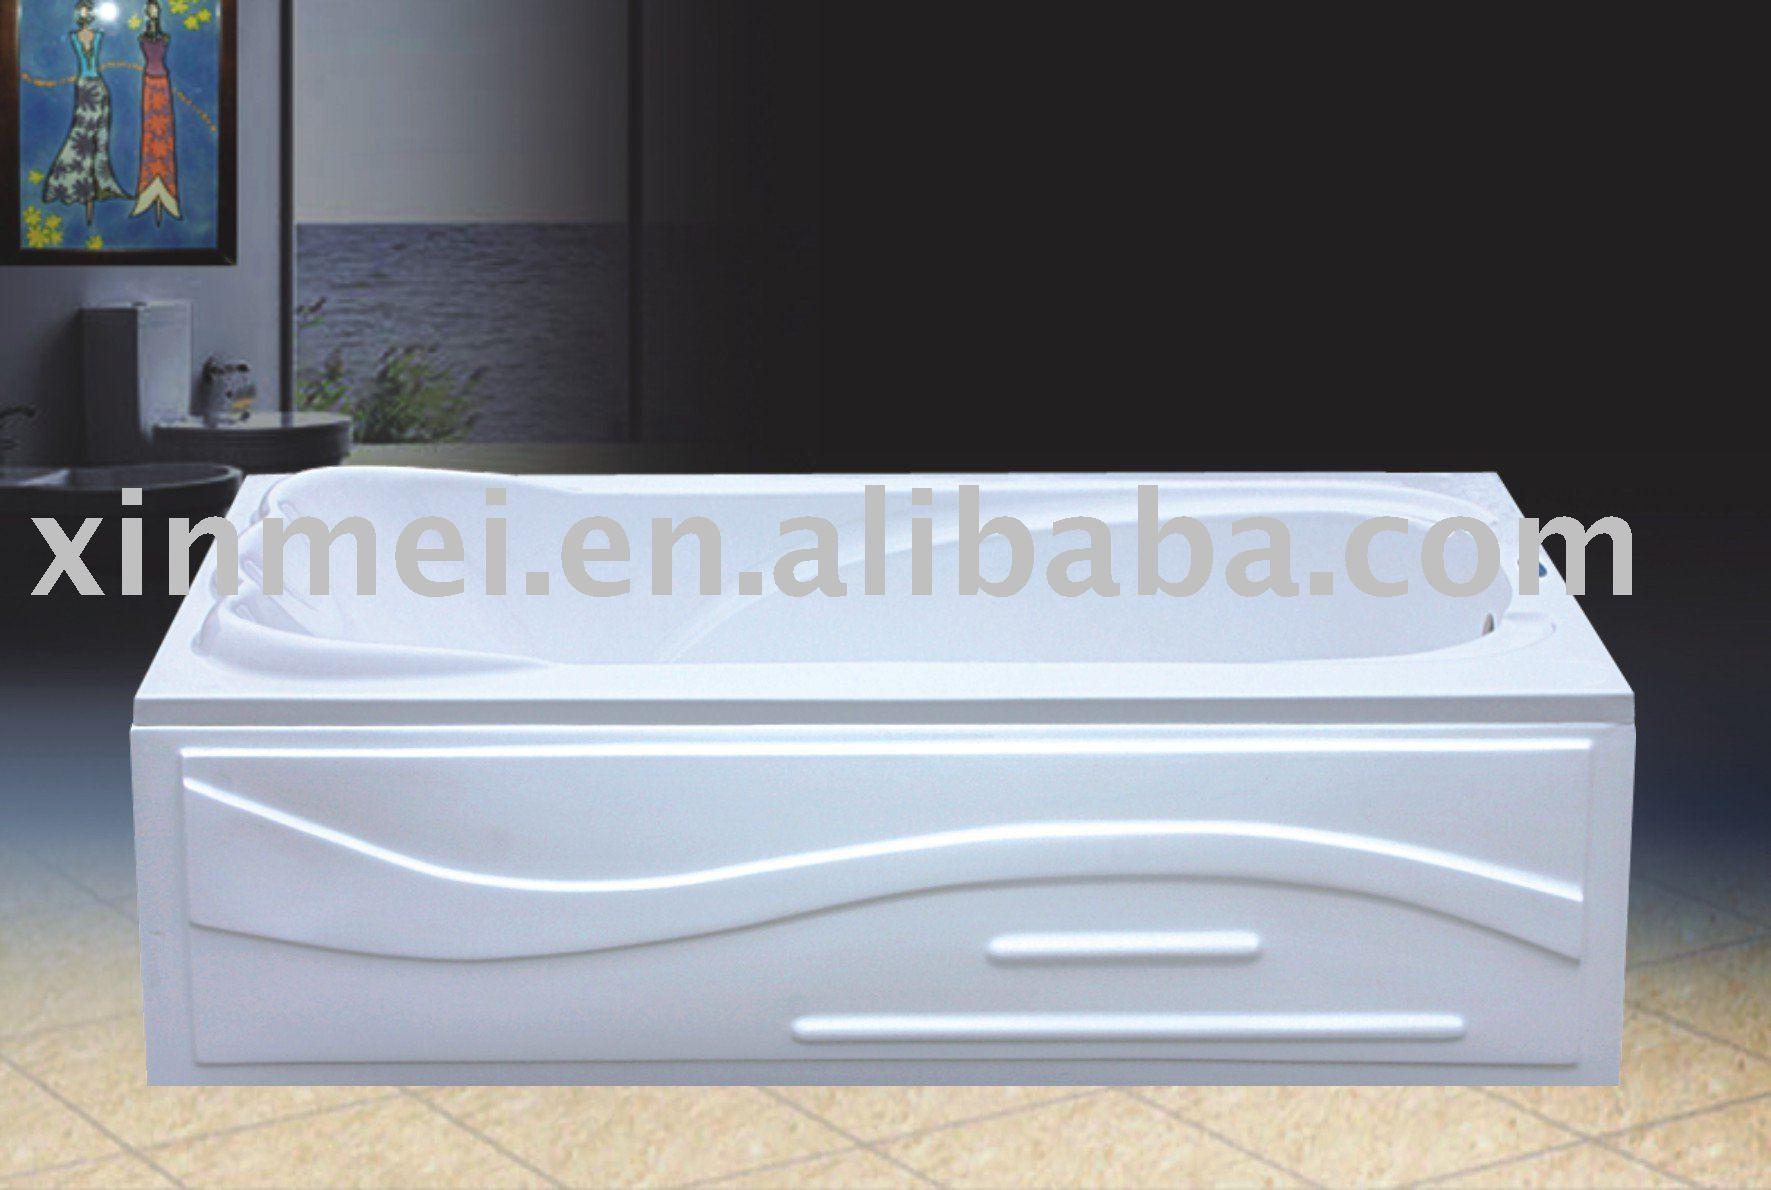 Acrylic bathtub apron bathtubs skirt bath tubs buy skirt for Best acrylic bathtub to buy